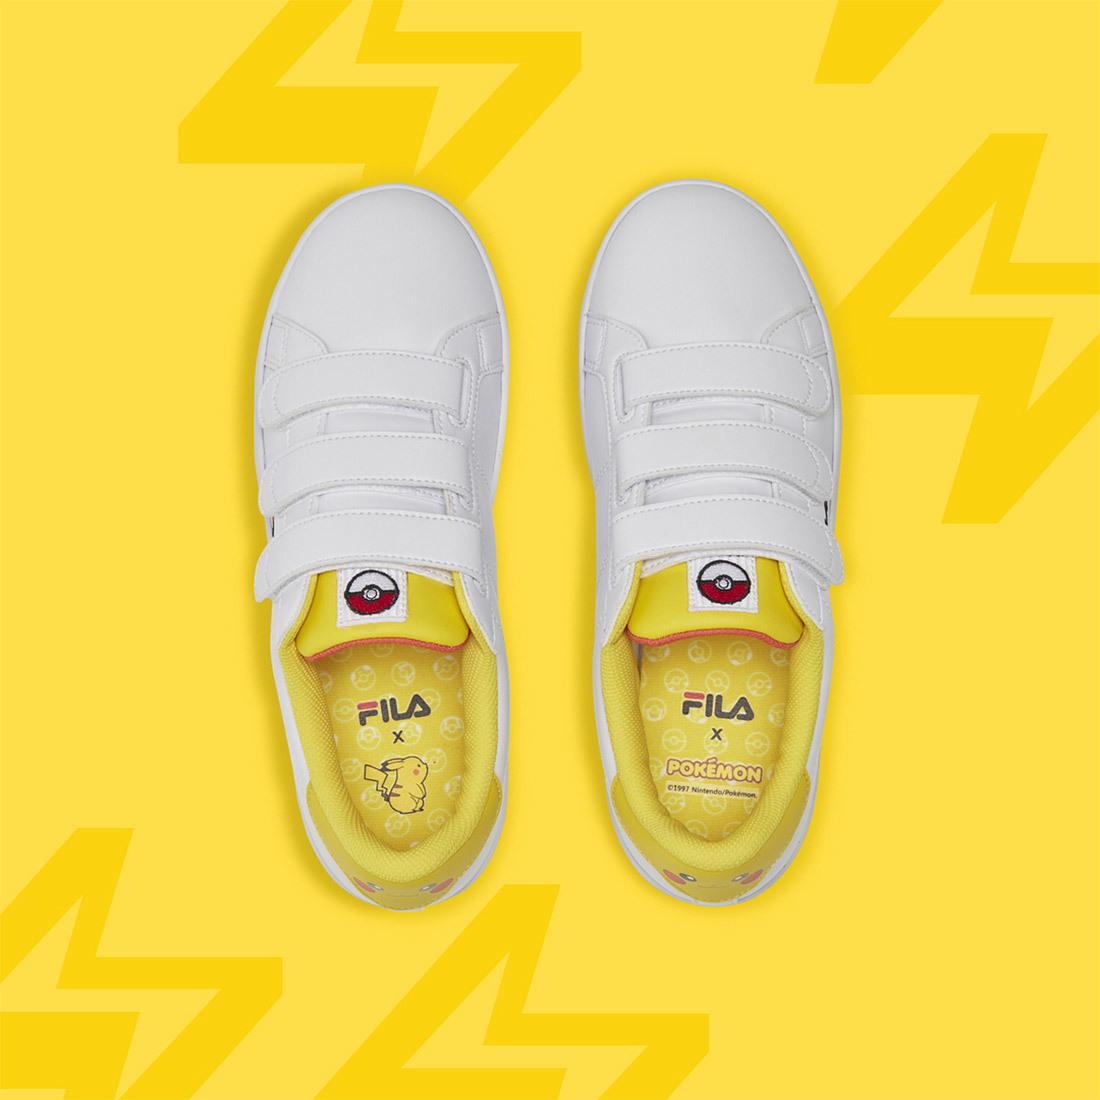 Collaboration: FILA x Pokemon